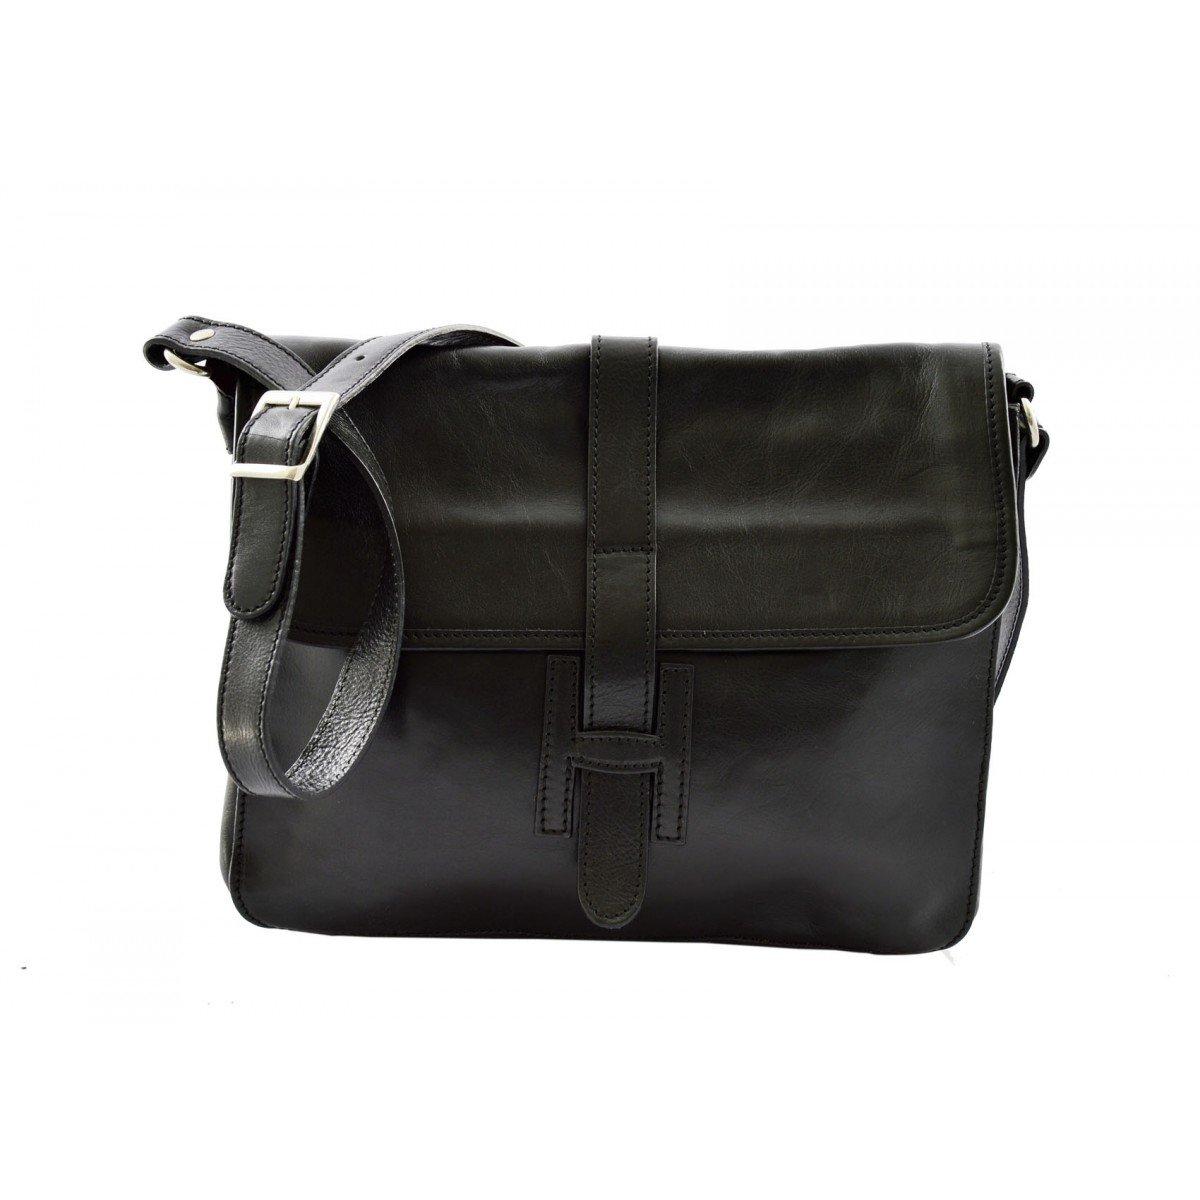 Dream Leather Bags Made in Italy Genuine Leather メンズ 26-1 US サイズ: 1 M US カラー: ブラック B074M9BXTD